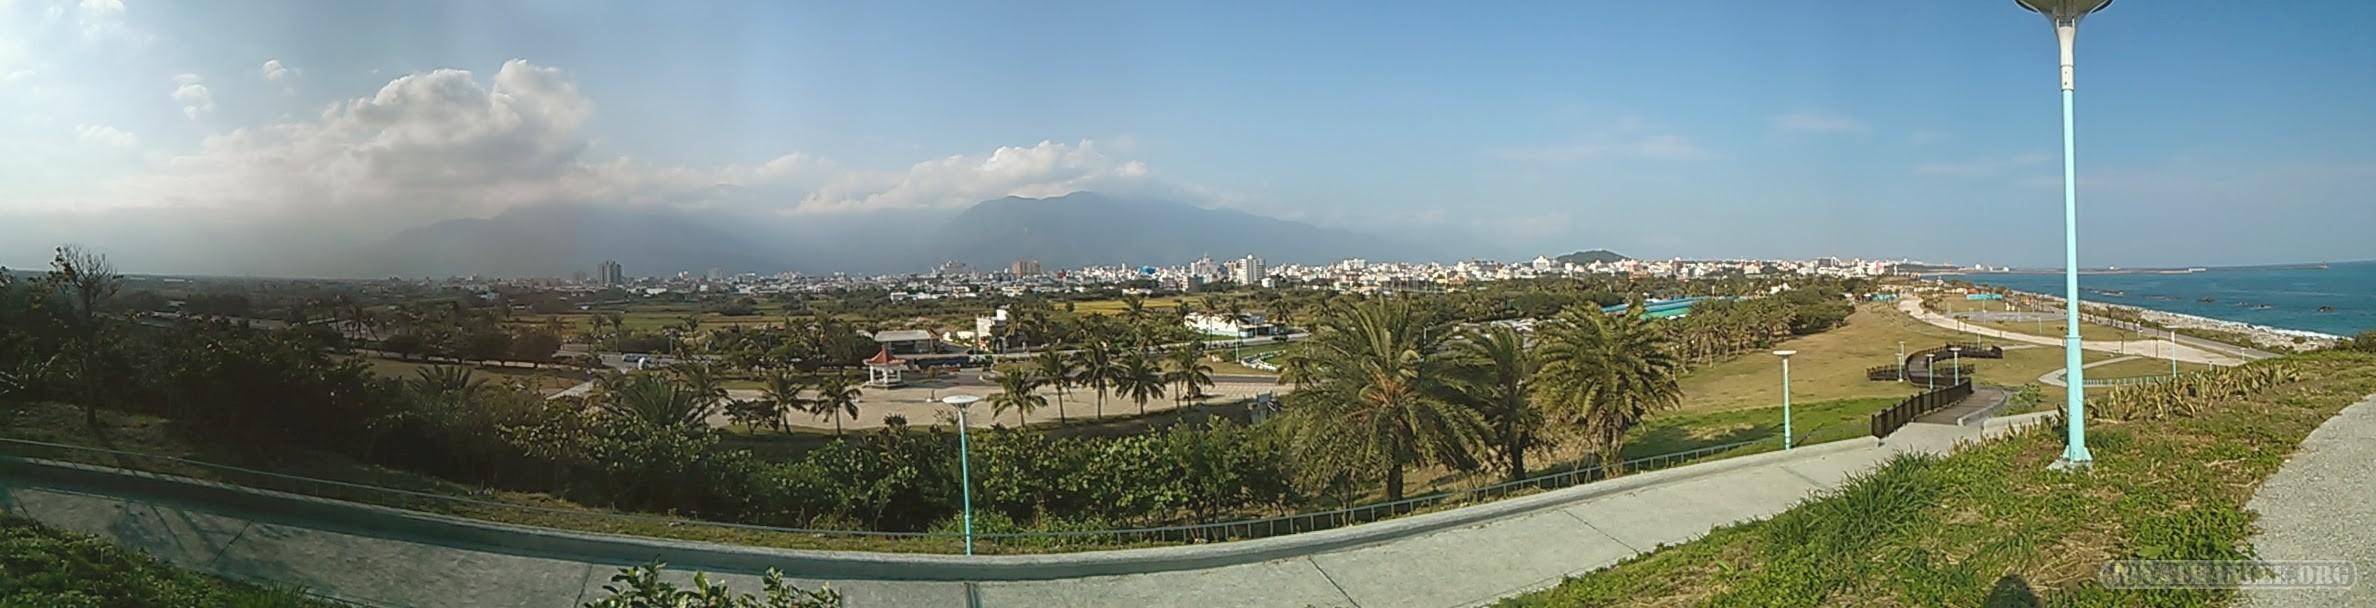 Hualien - city panorama